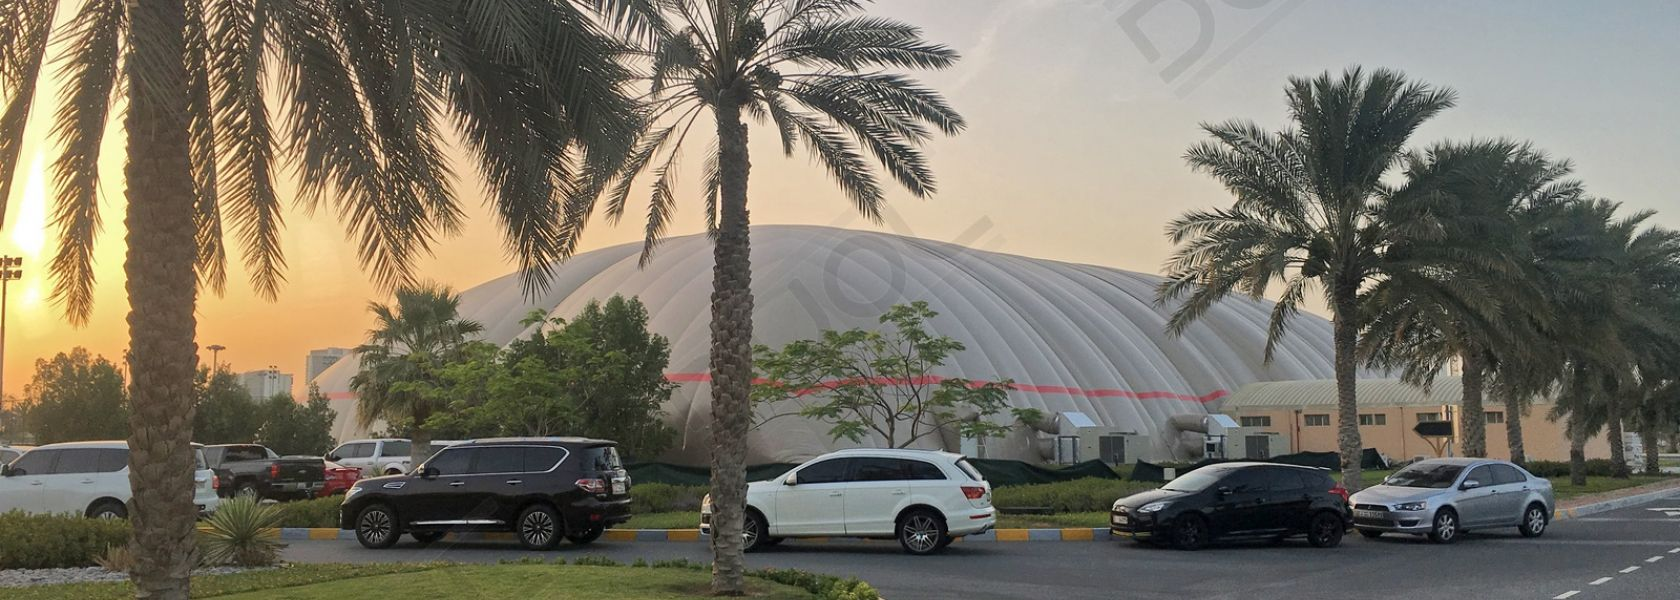 Military officers' accomodation, Abu Dhabi